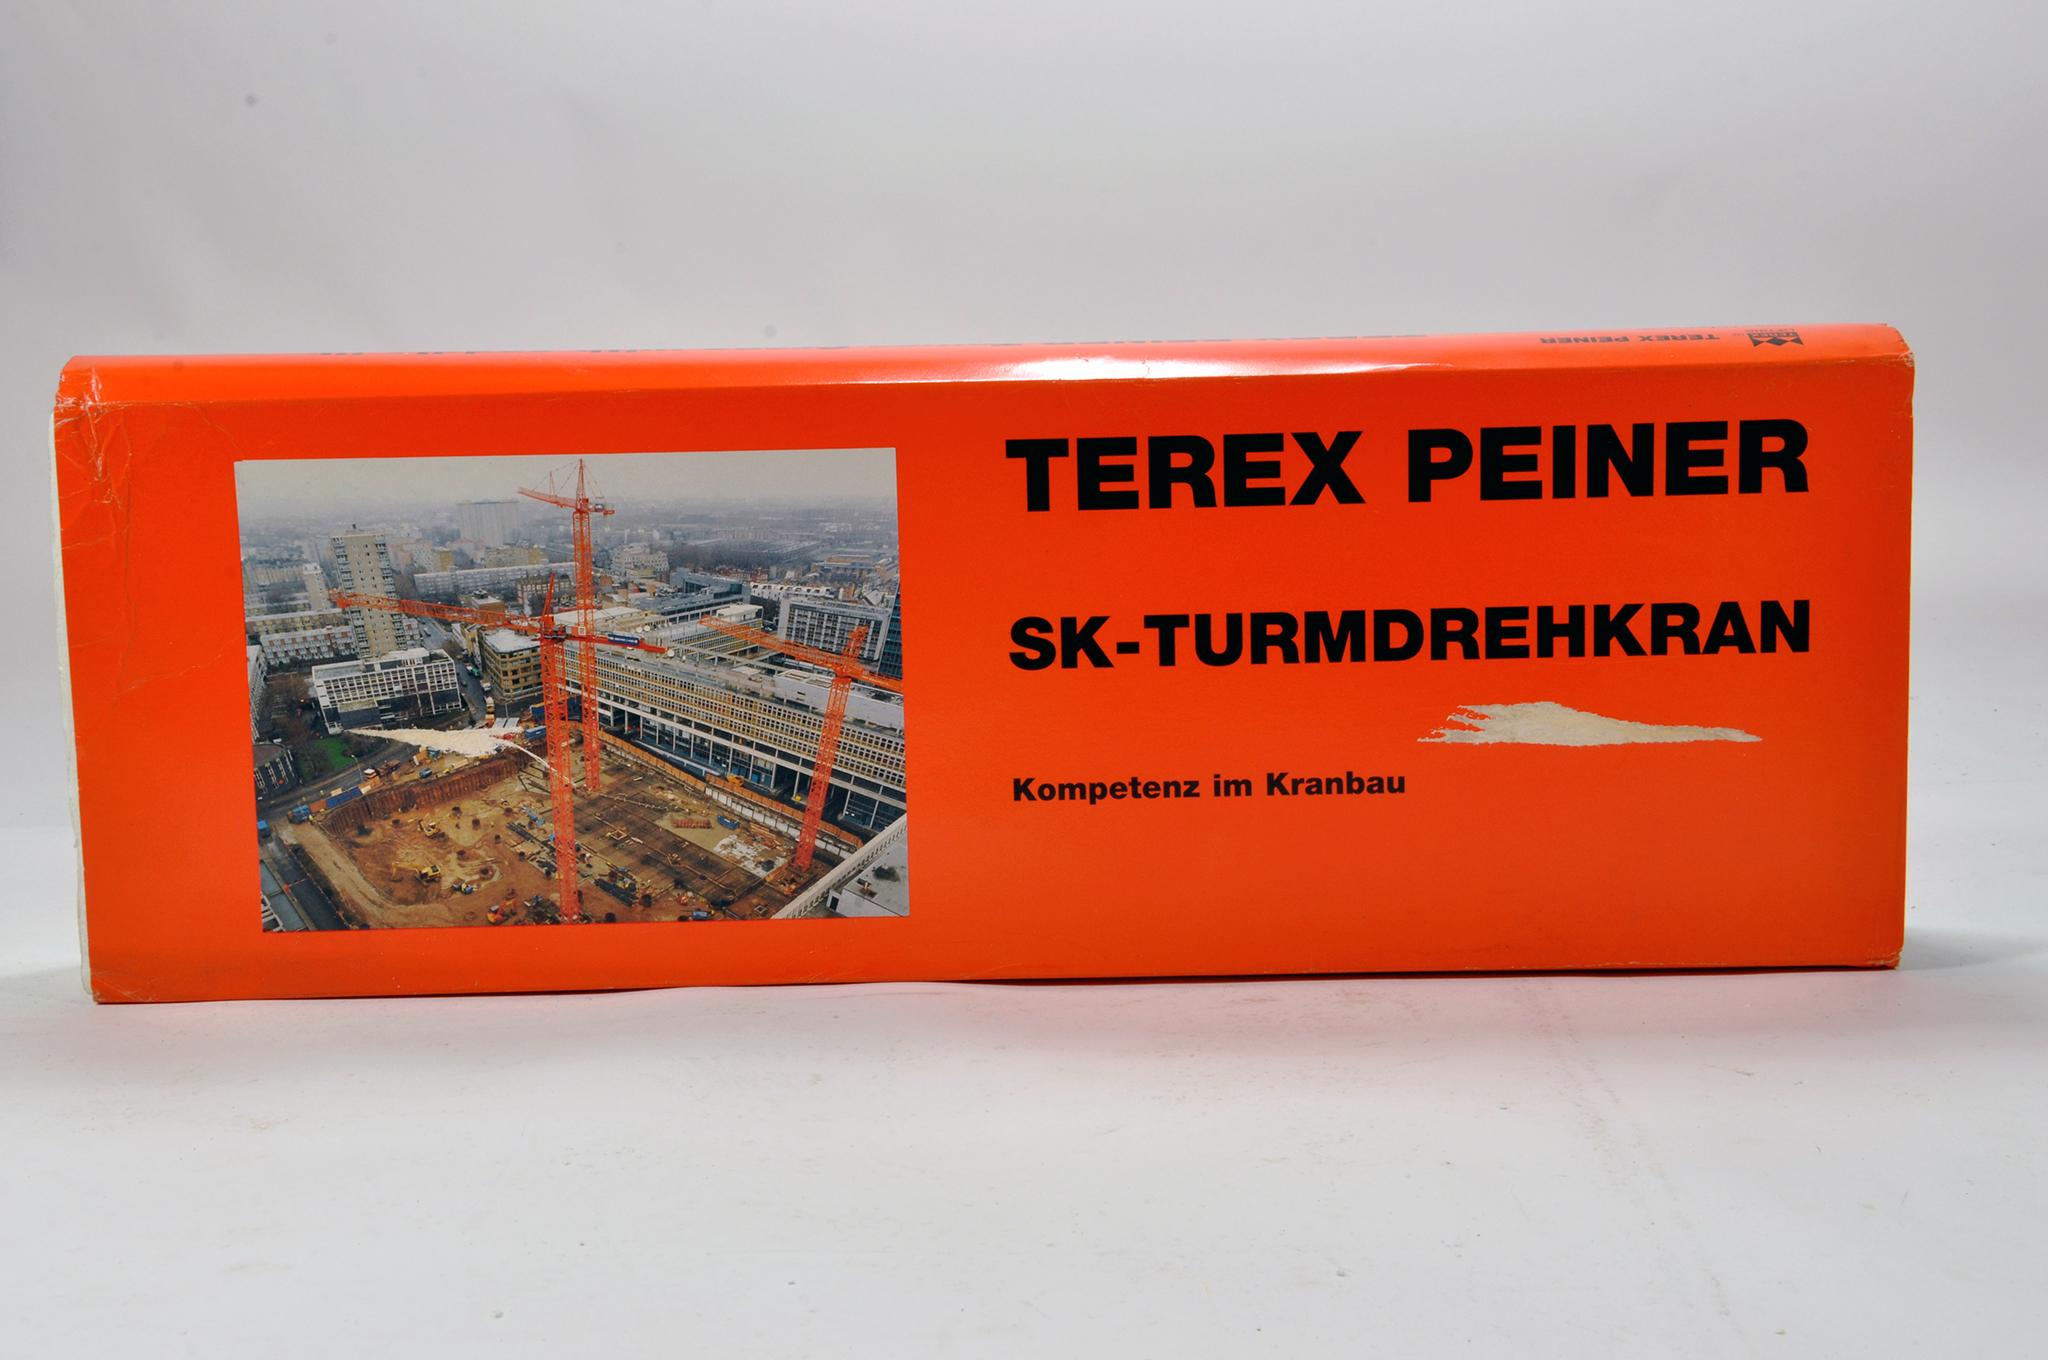 Lot 314 - Conrad 1/87 construction issue comprising No. 2010 Terex Peiner SK Tower Crane. E to NM.